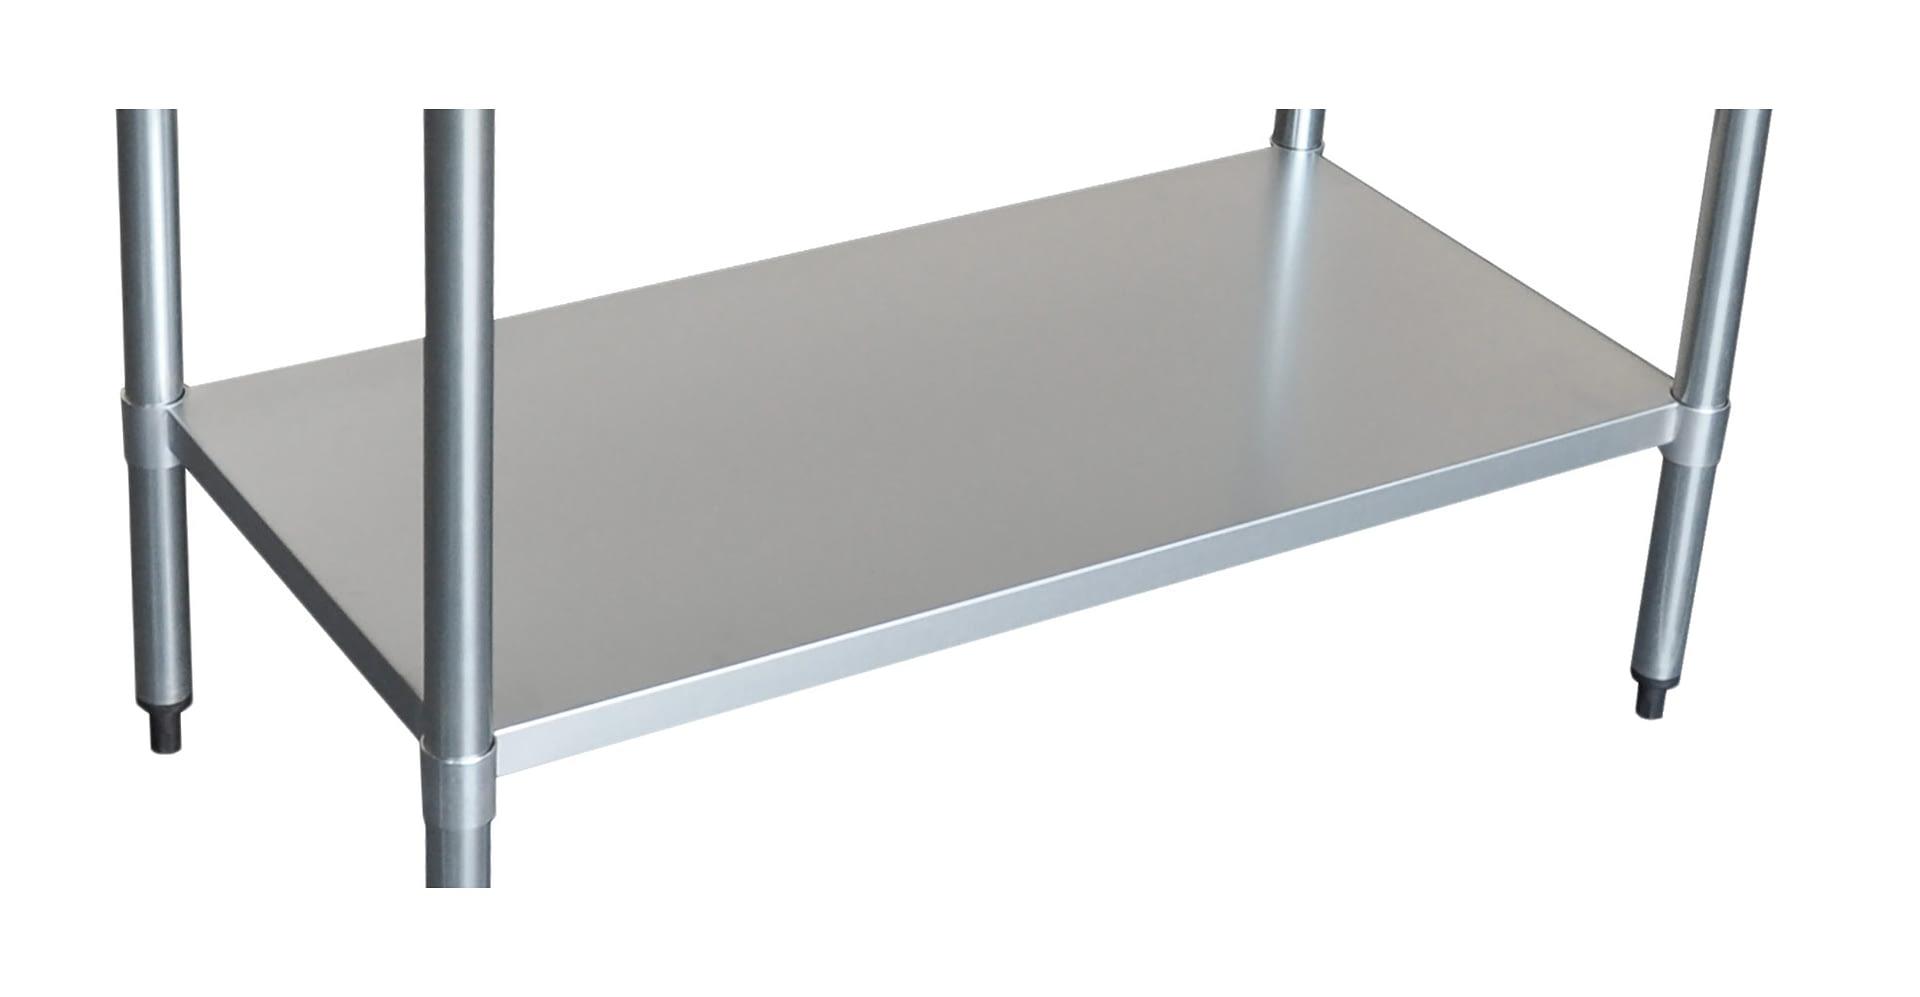 Stainless Undershelf for 2472 Bench